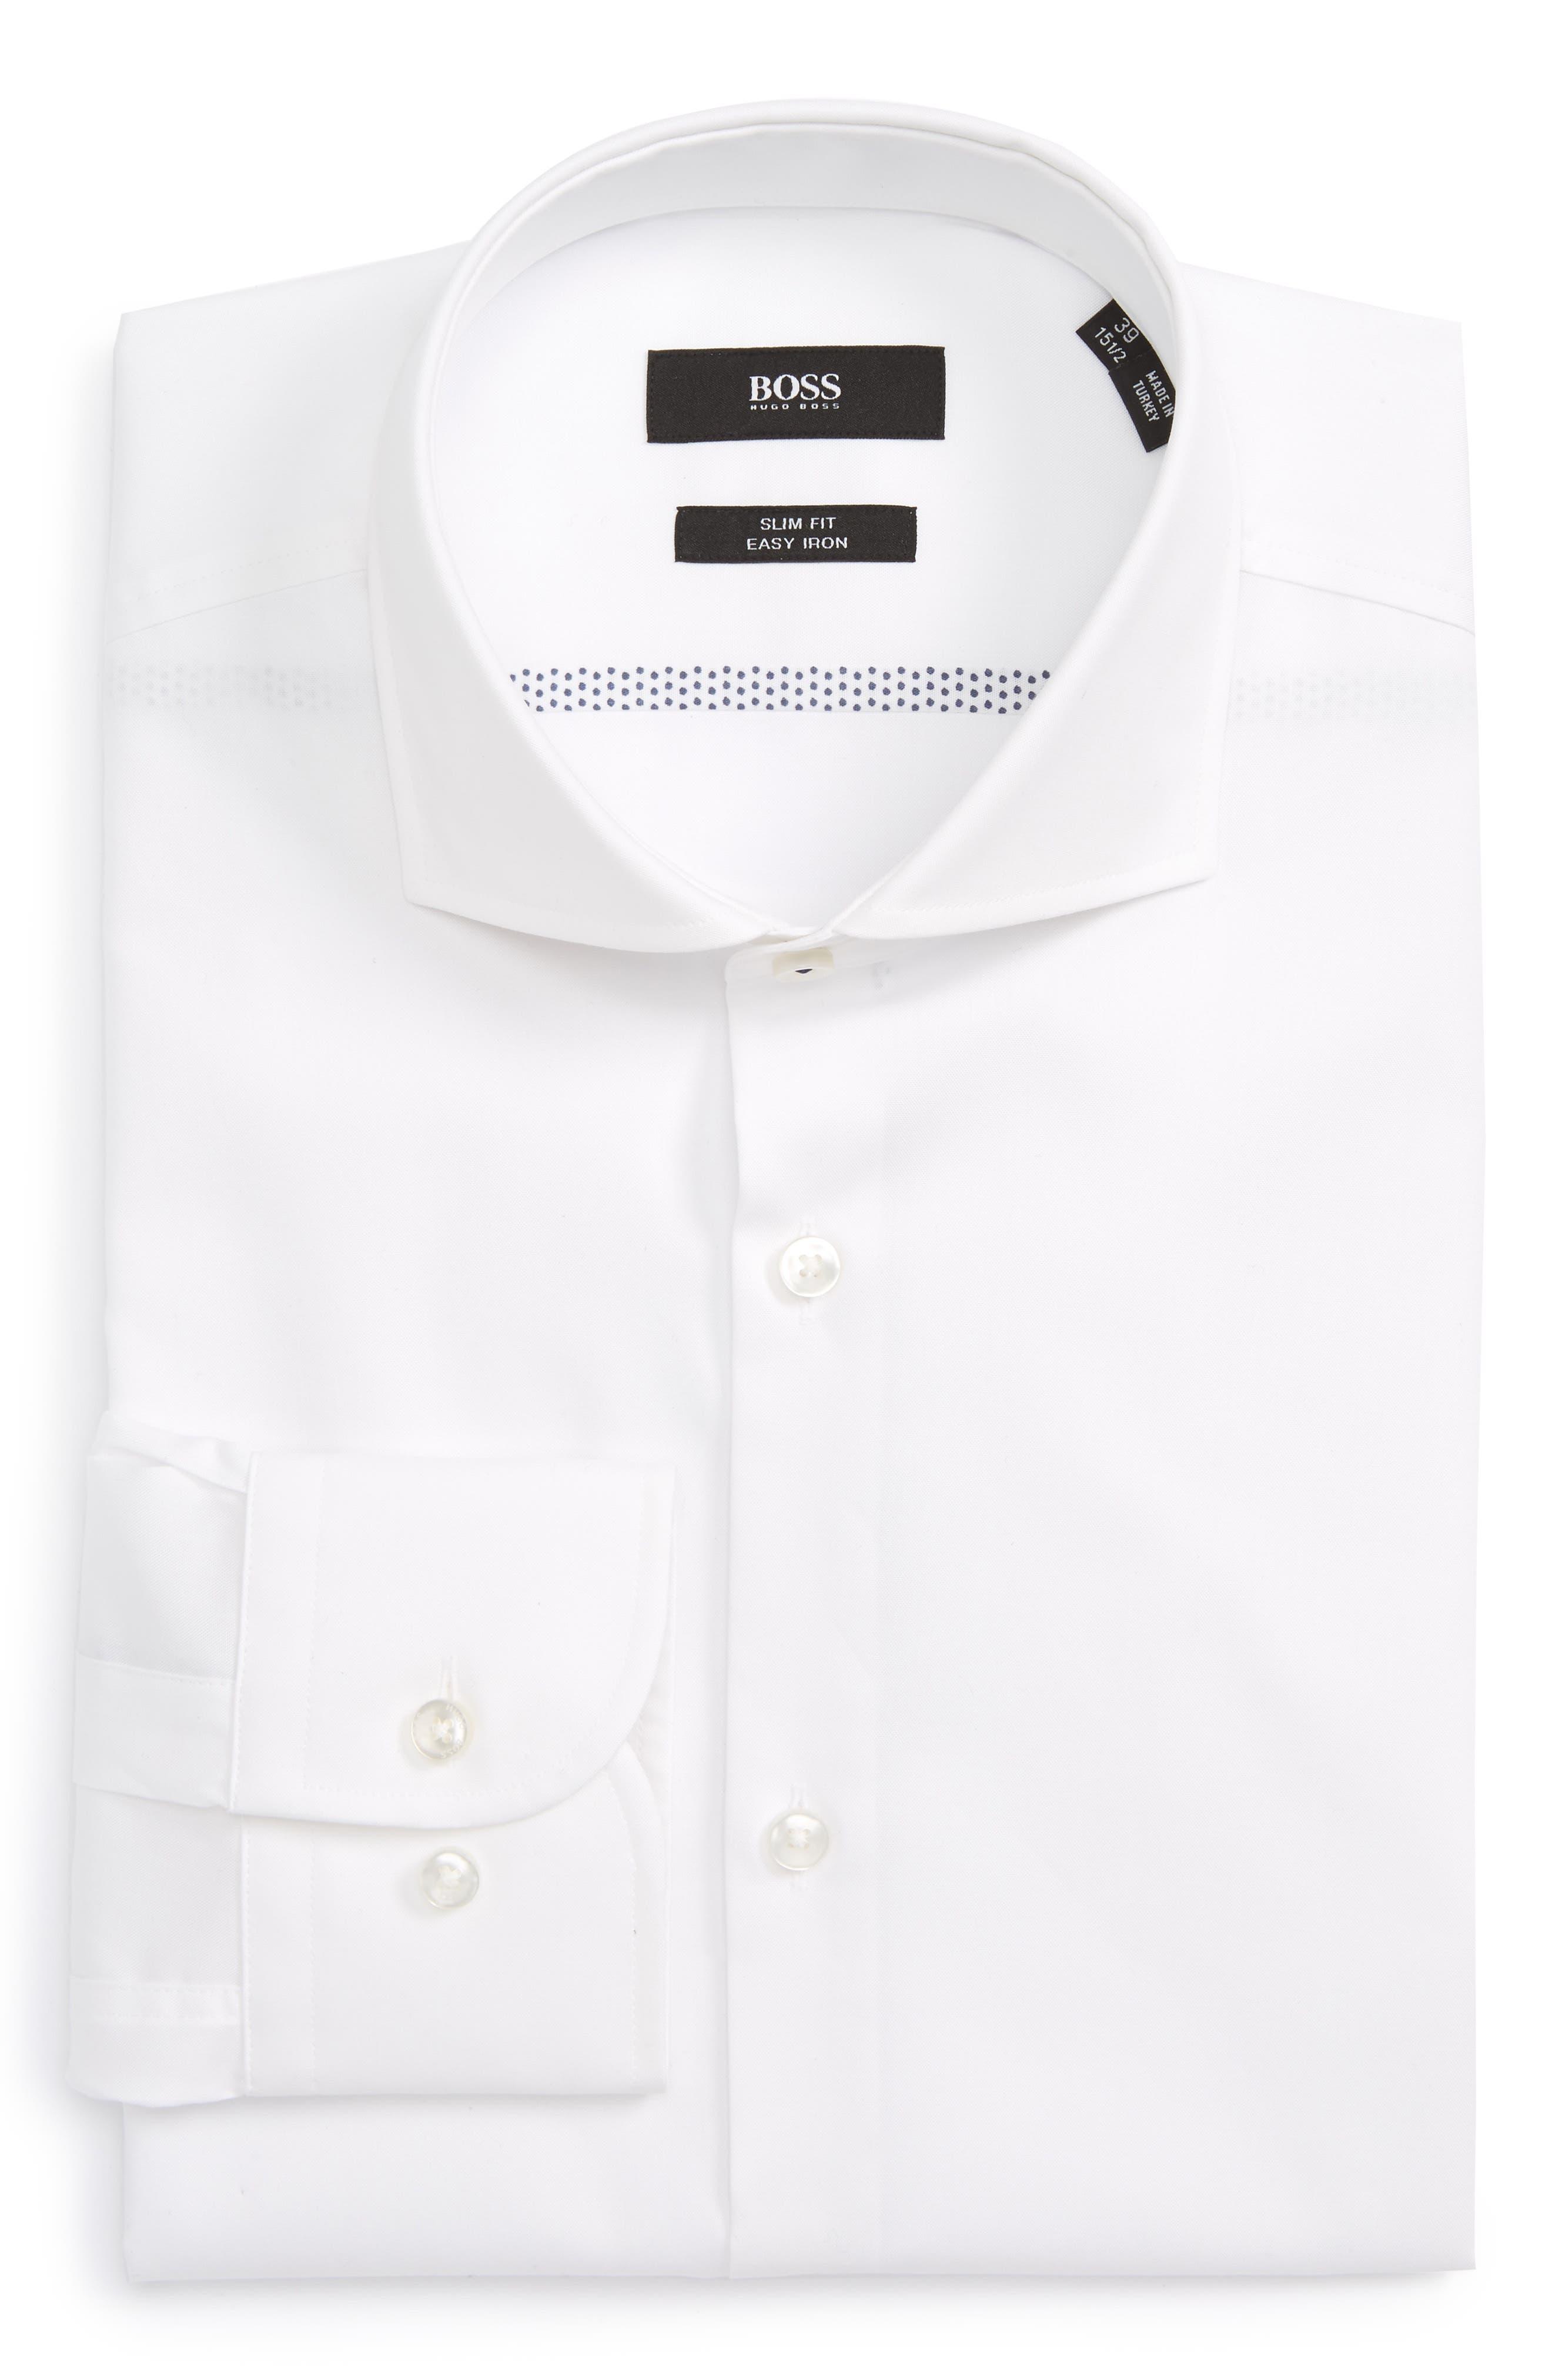 BOSS Slim Fit Solid Dress Shirt